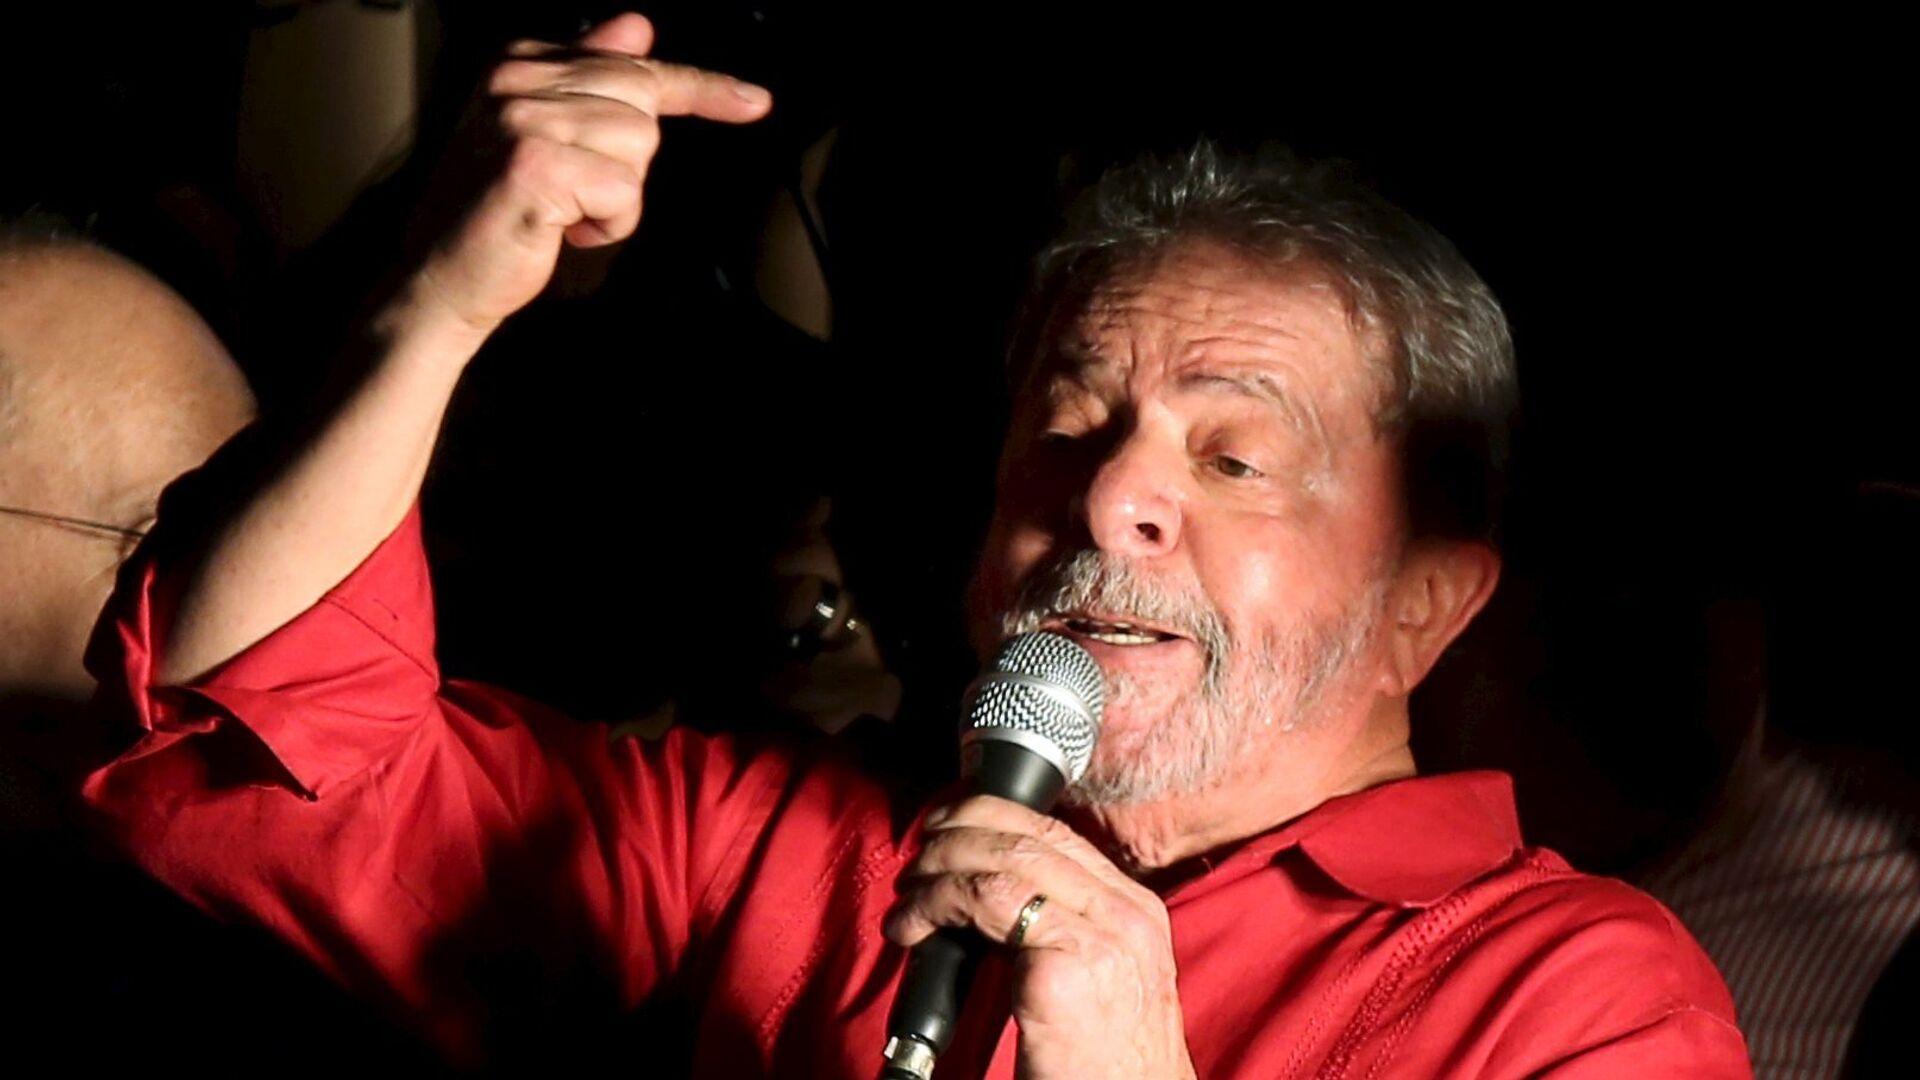 Luiz Inácio Lula da Silva, ex presidente de Brasil - Sputnik Mundo, 1920, 13.09.2021